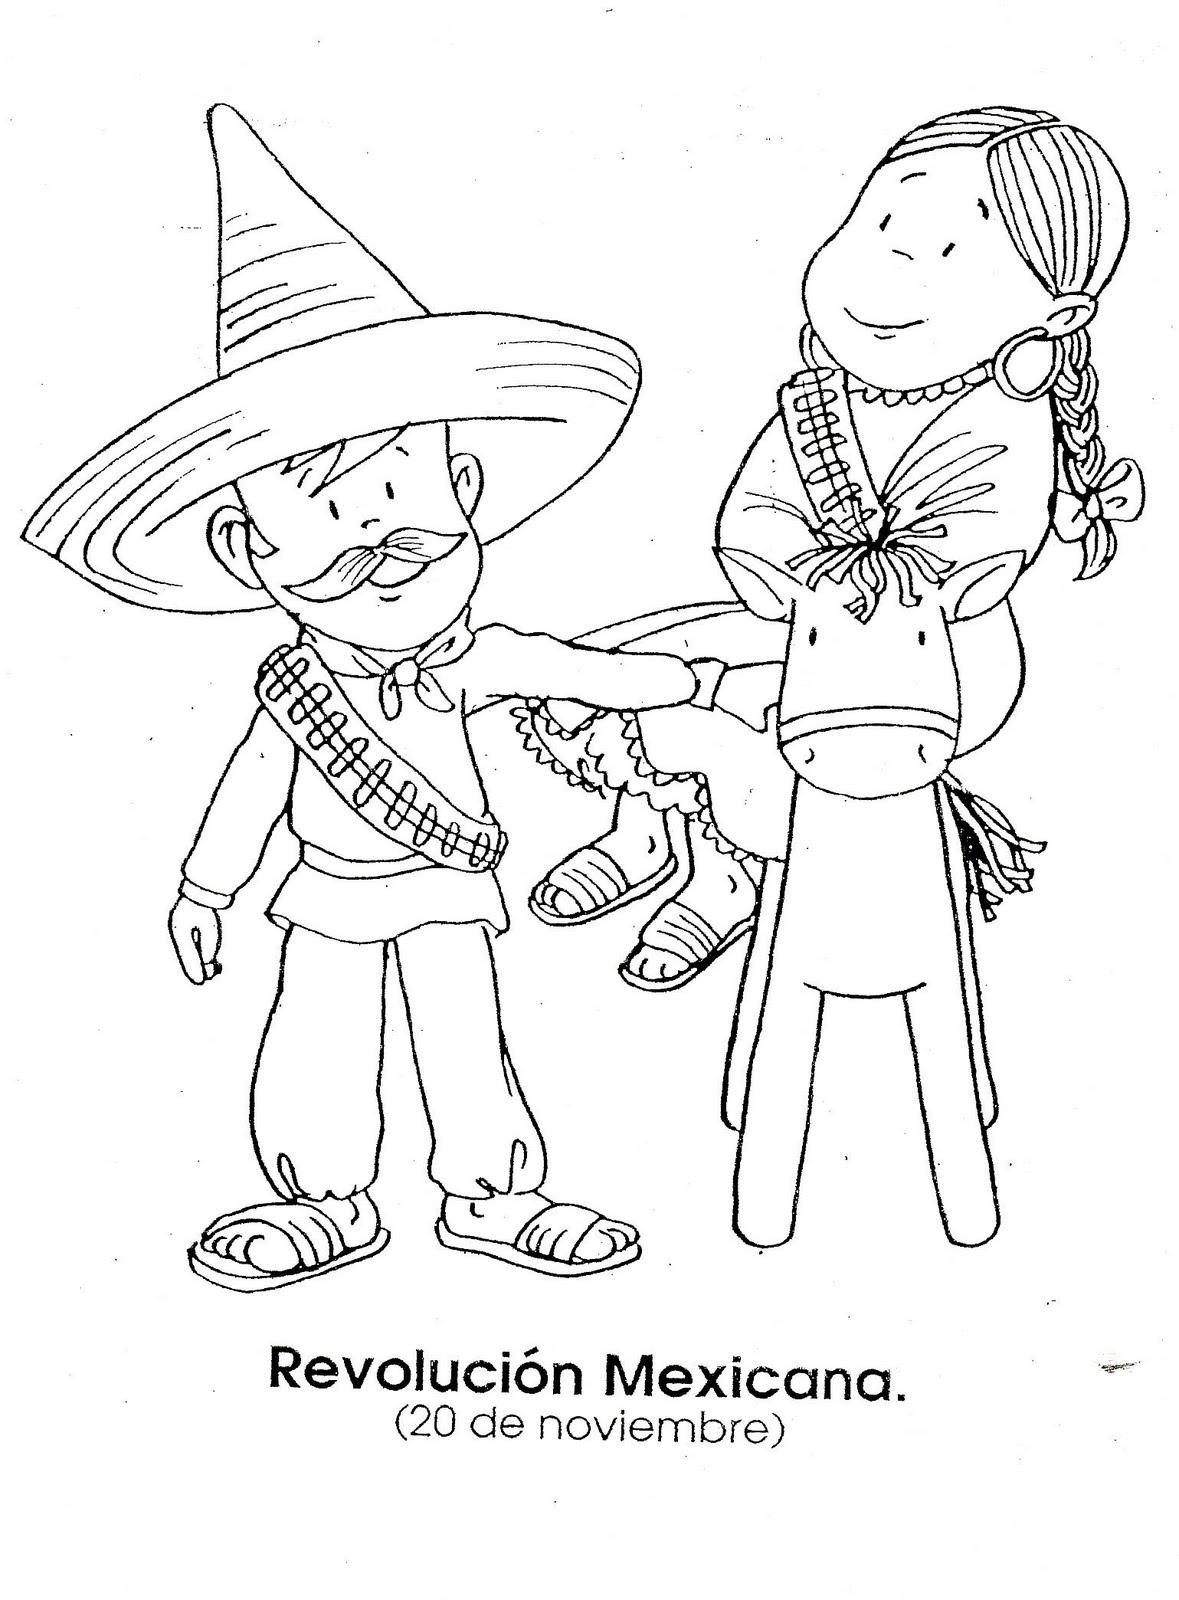 la revoluci u00f3n mexicana - dibujos para colorear